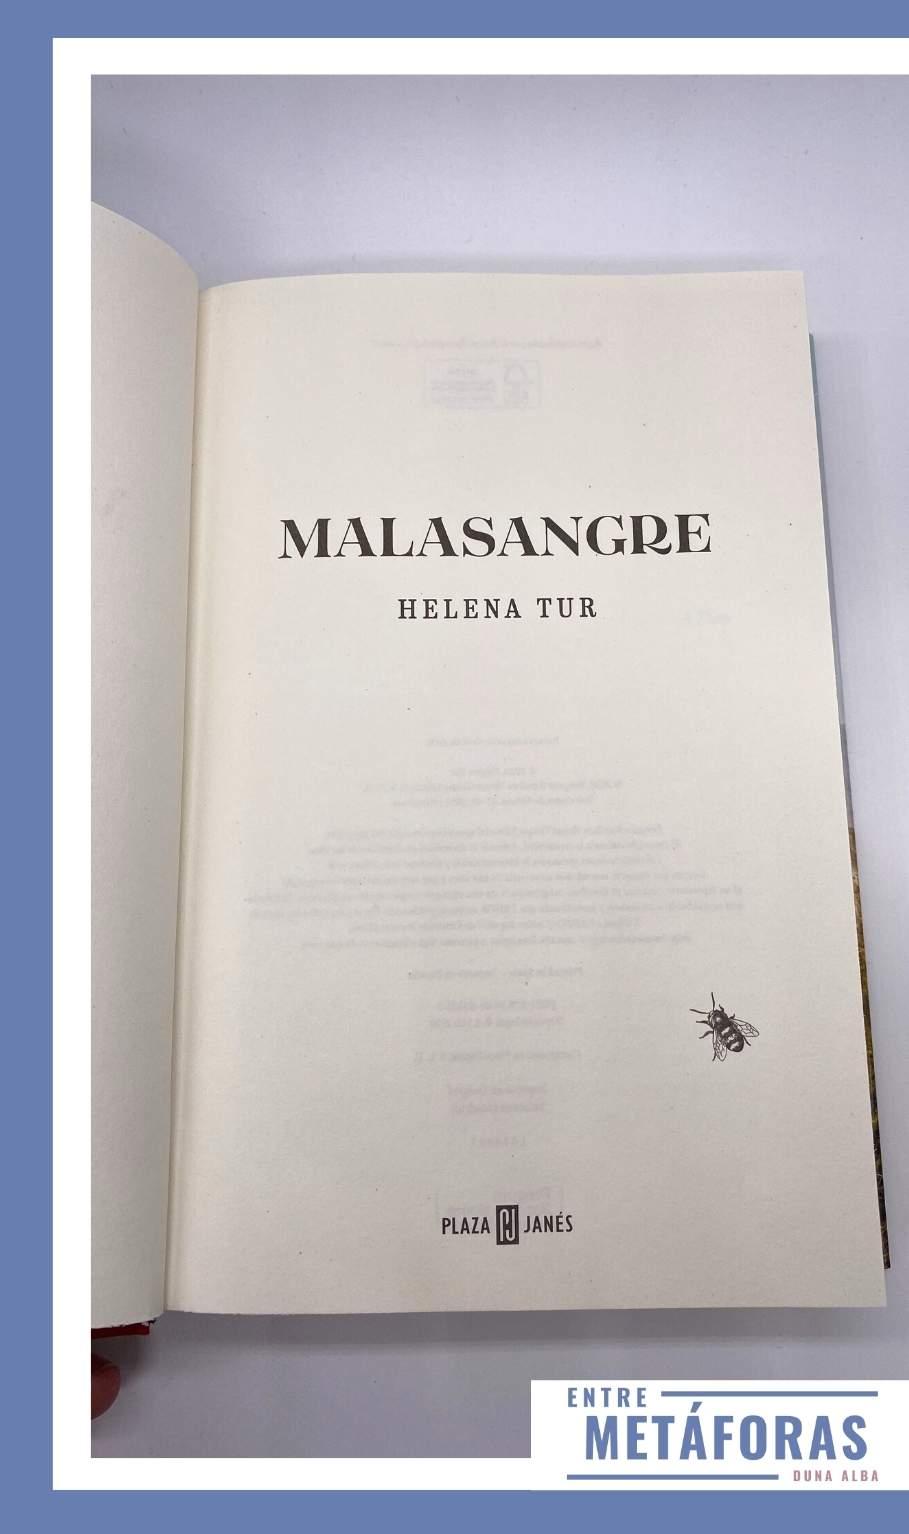 Malasangre, de Helena Tur